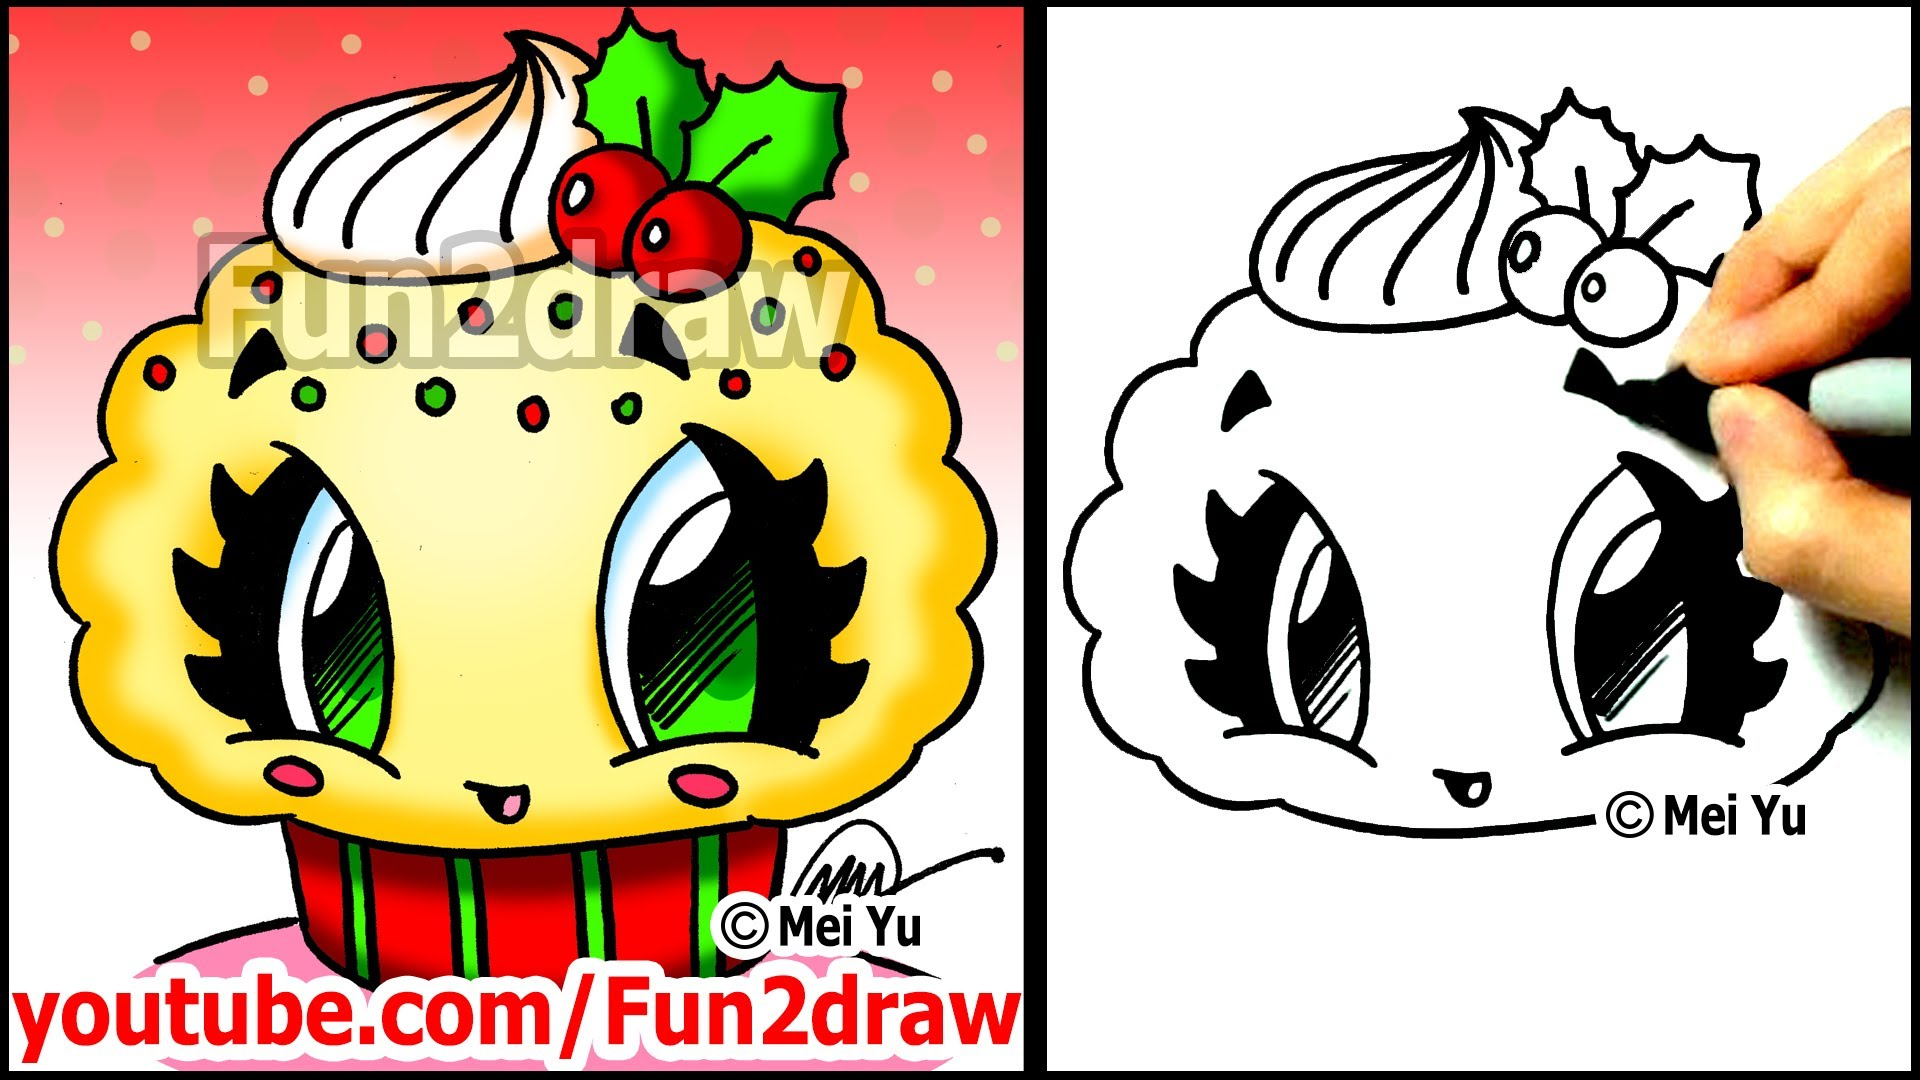 Drawn santa mei yu With Christmas Desserts Holly Desserts